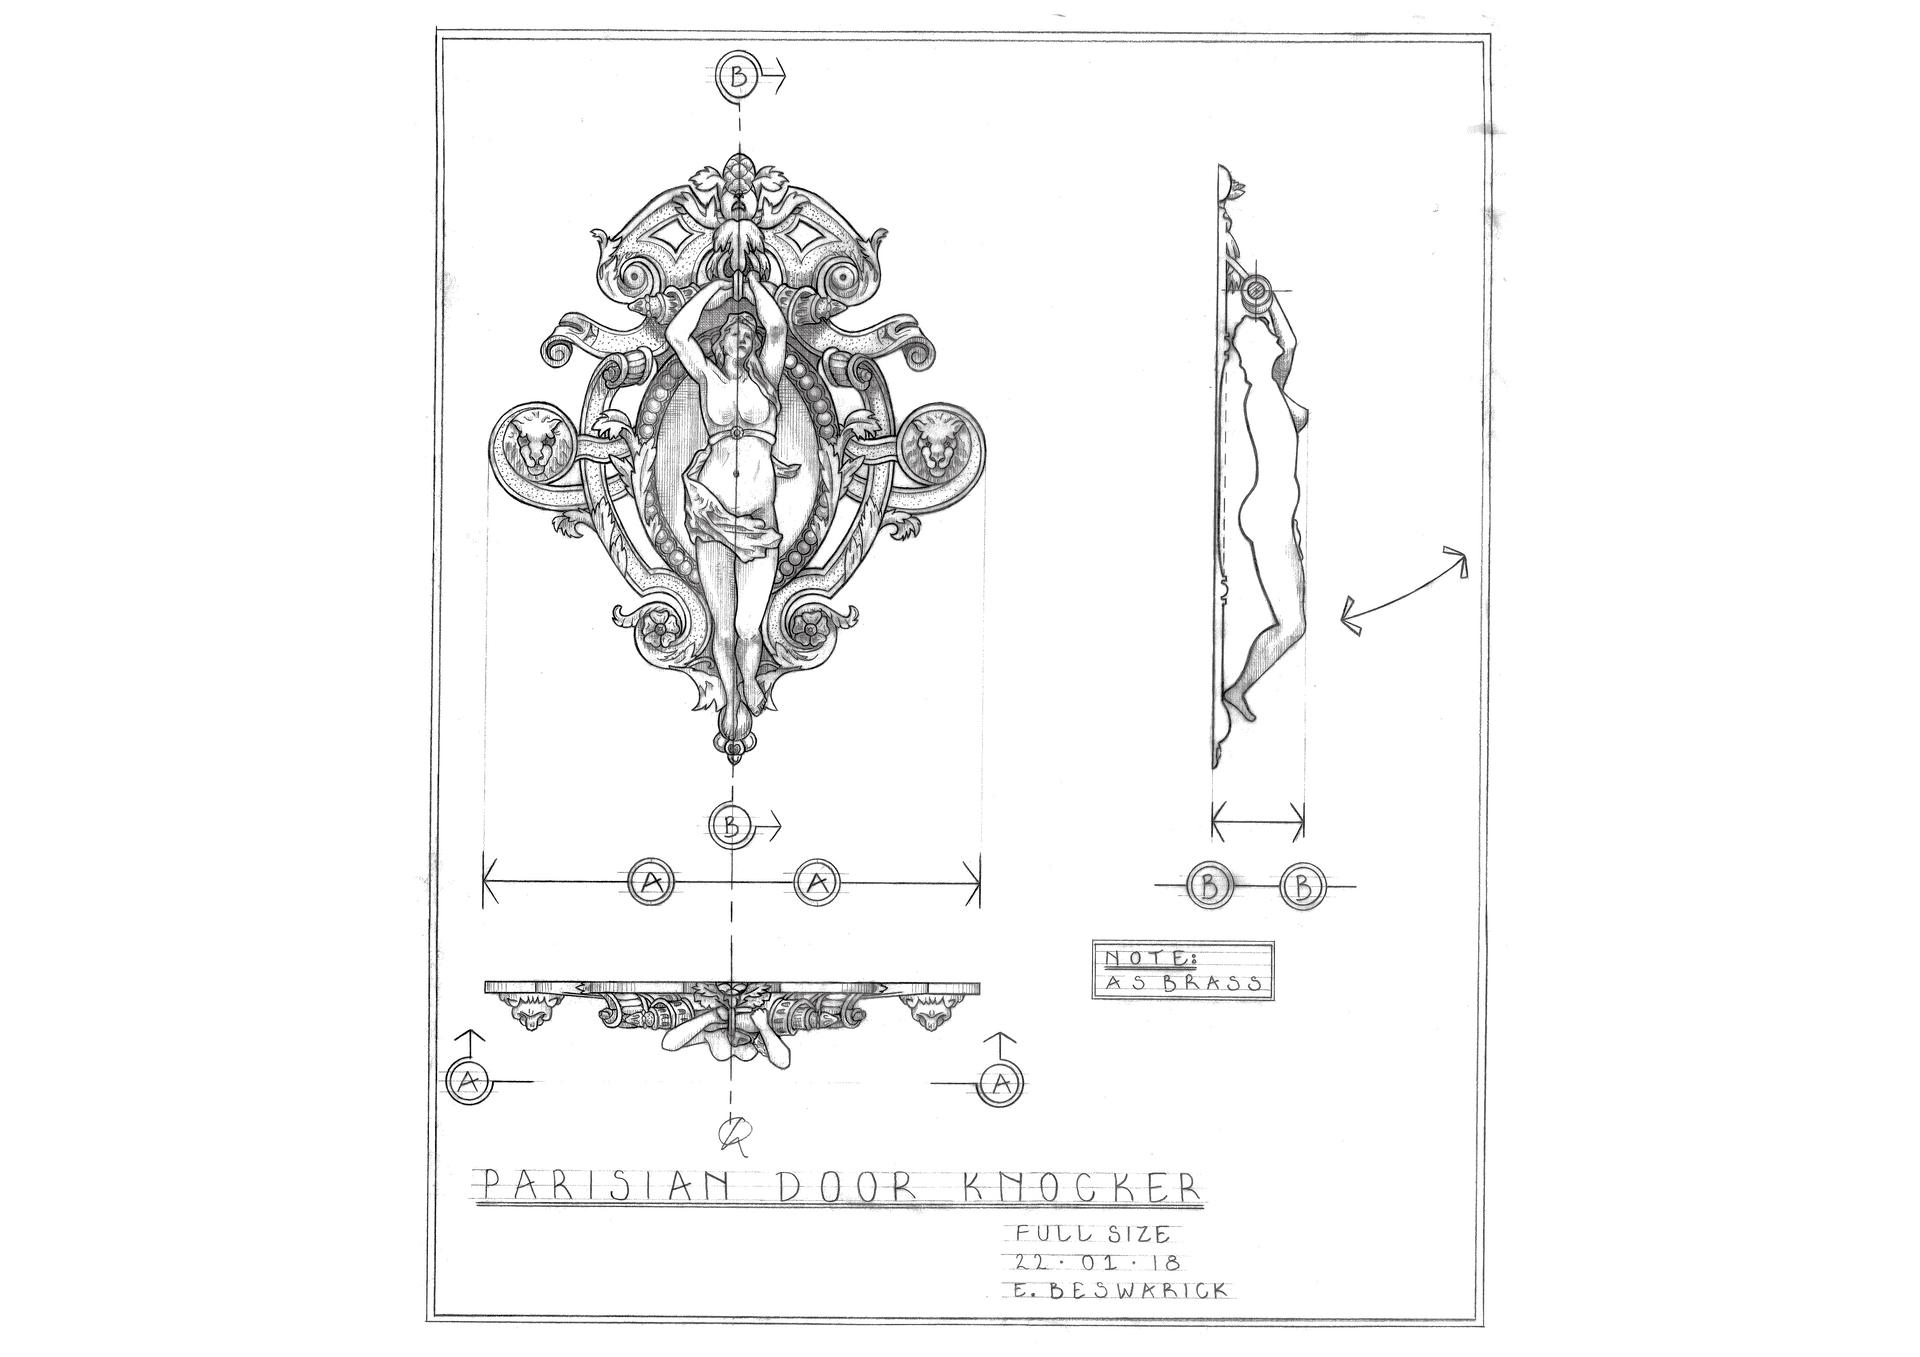 PARISIAN DOOR KNOCKER